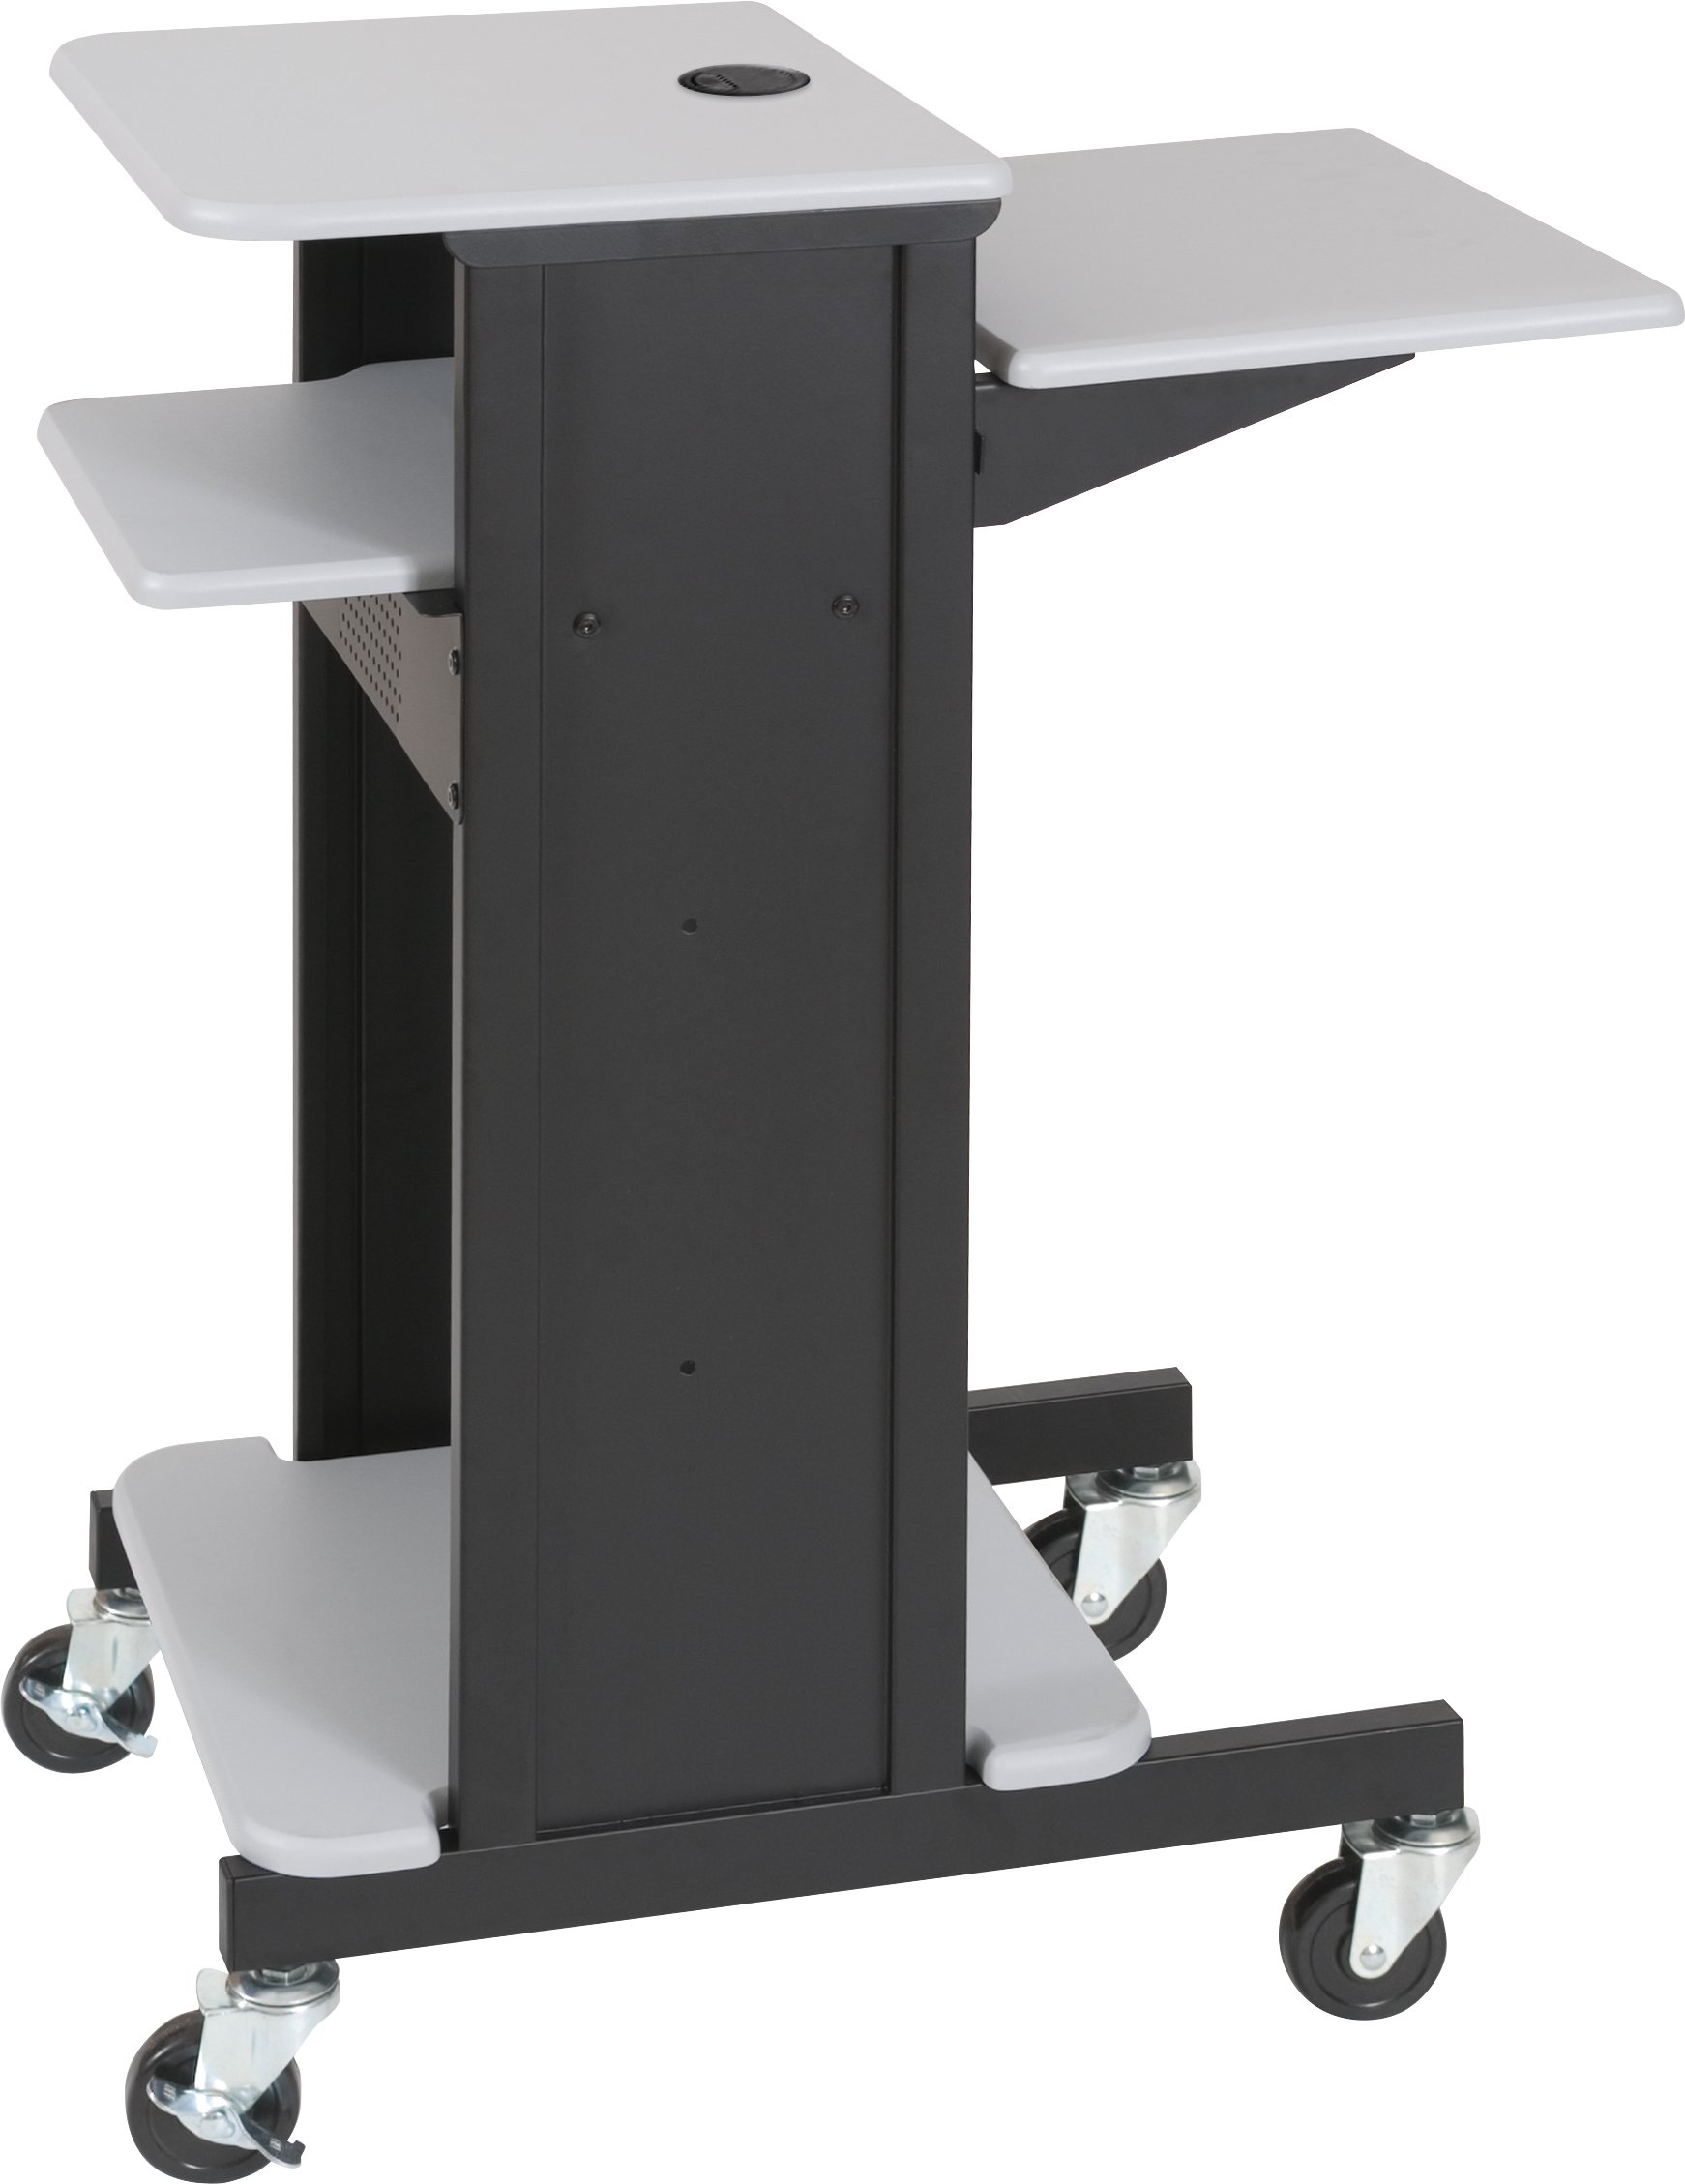 BALT 89759 Adjustable Presentation Cart, 18w x 30d x 40-1/4h, Black/Gray by Balt (Image #5)